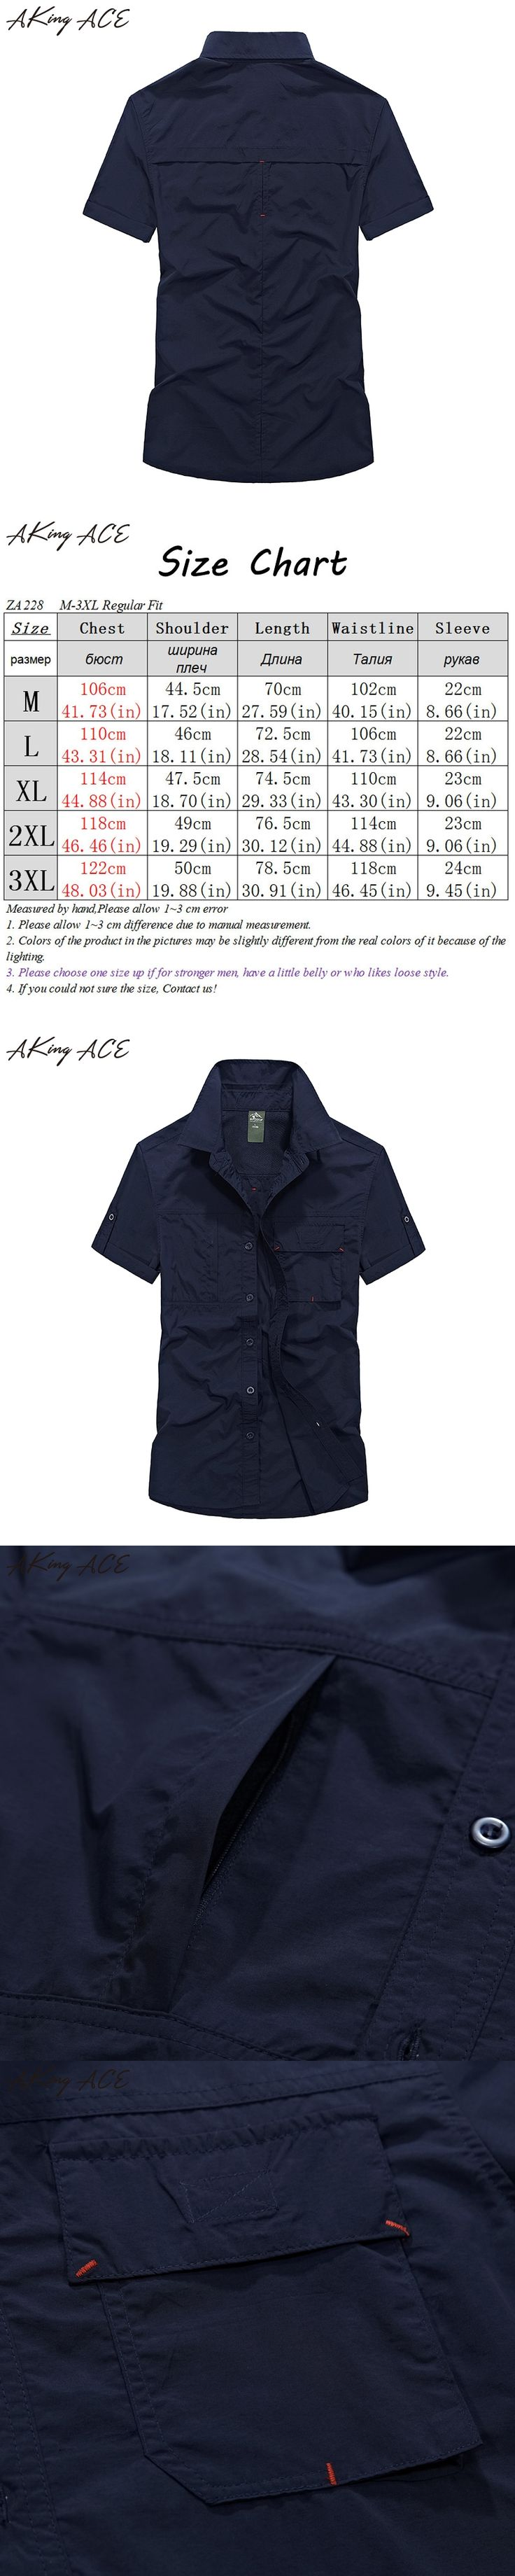 2017 AKing ACE NEW Arrivals Men's air force shirt short sleeve blouse shirt male hawaiian waterproof man cargo shirts ,ZA227